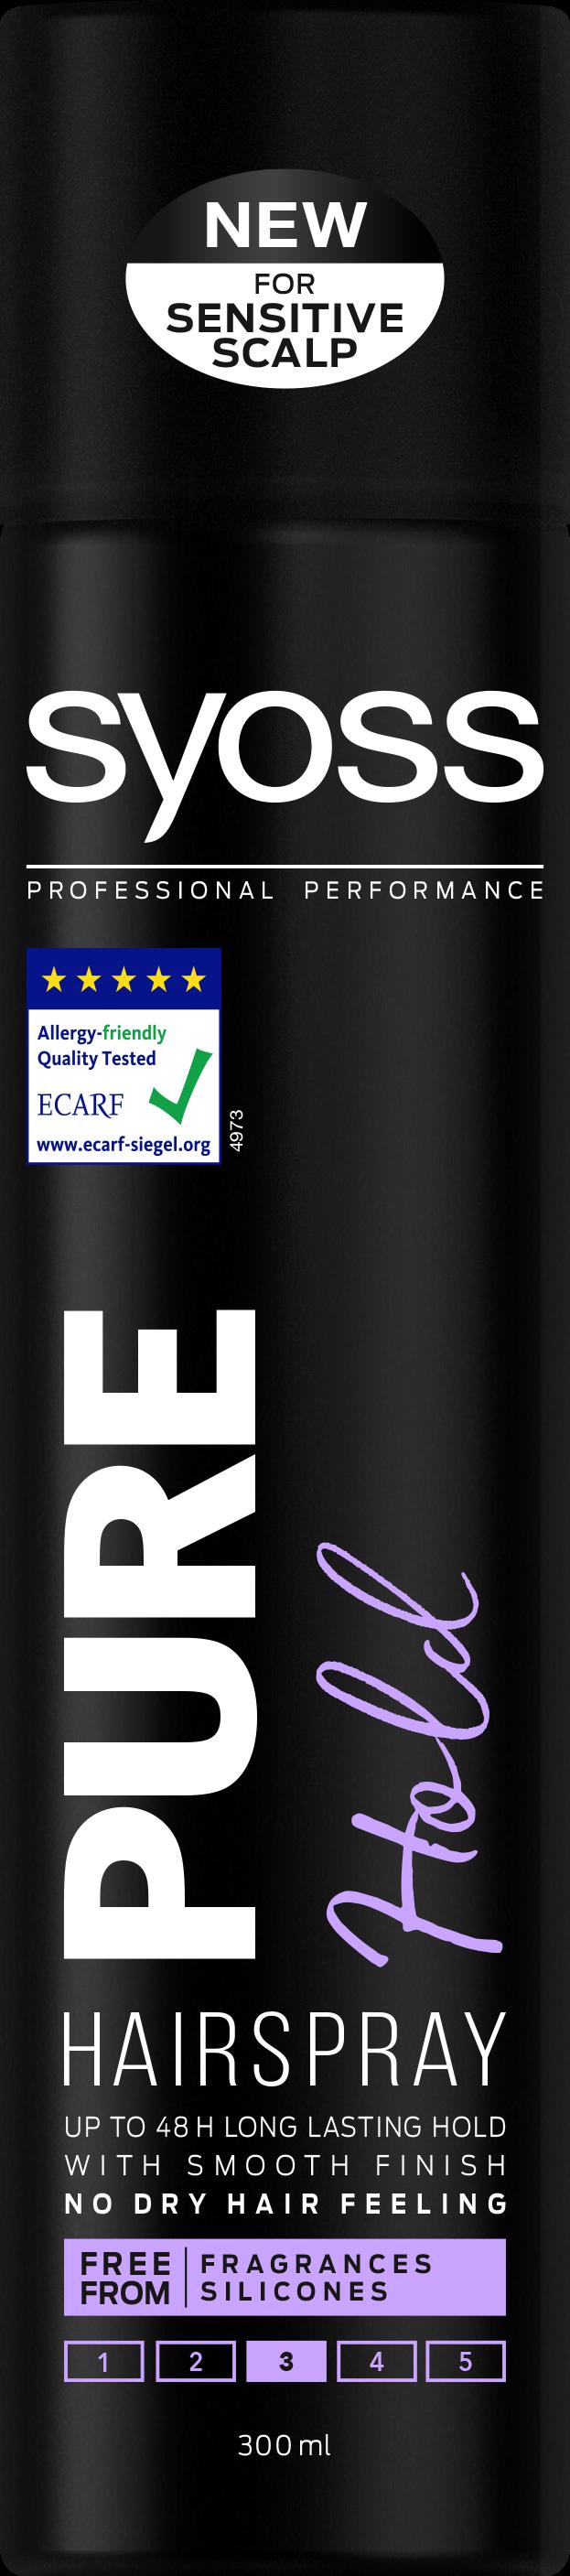 Syoss Pure Hold Hairspray